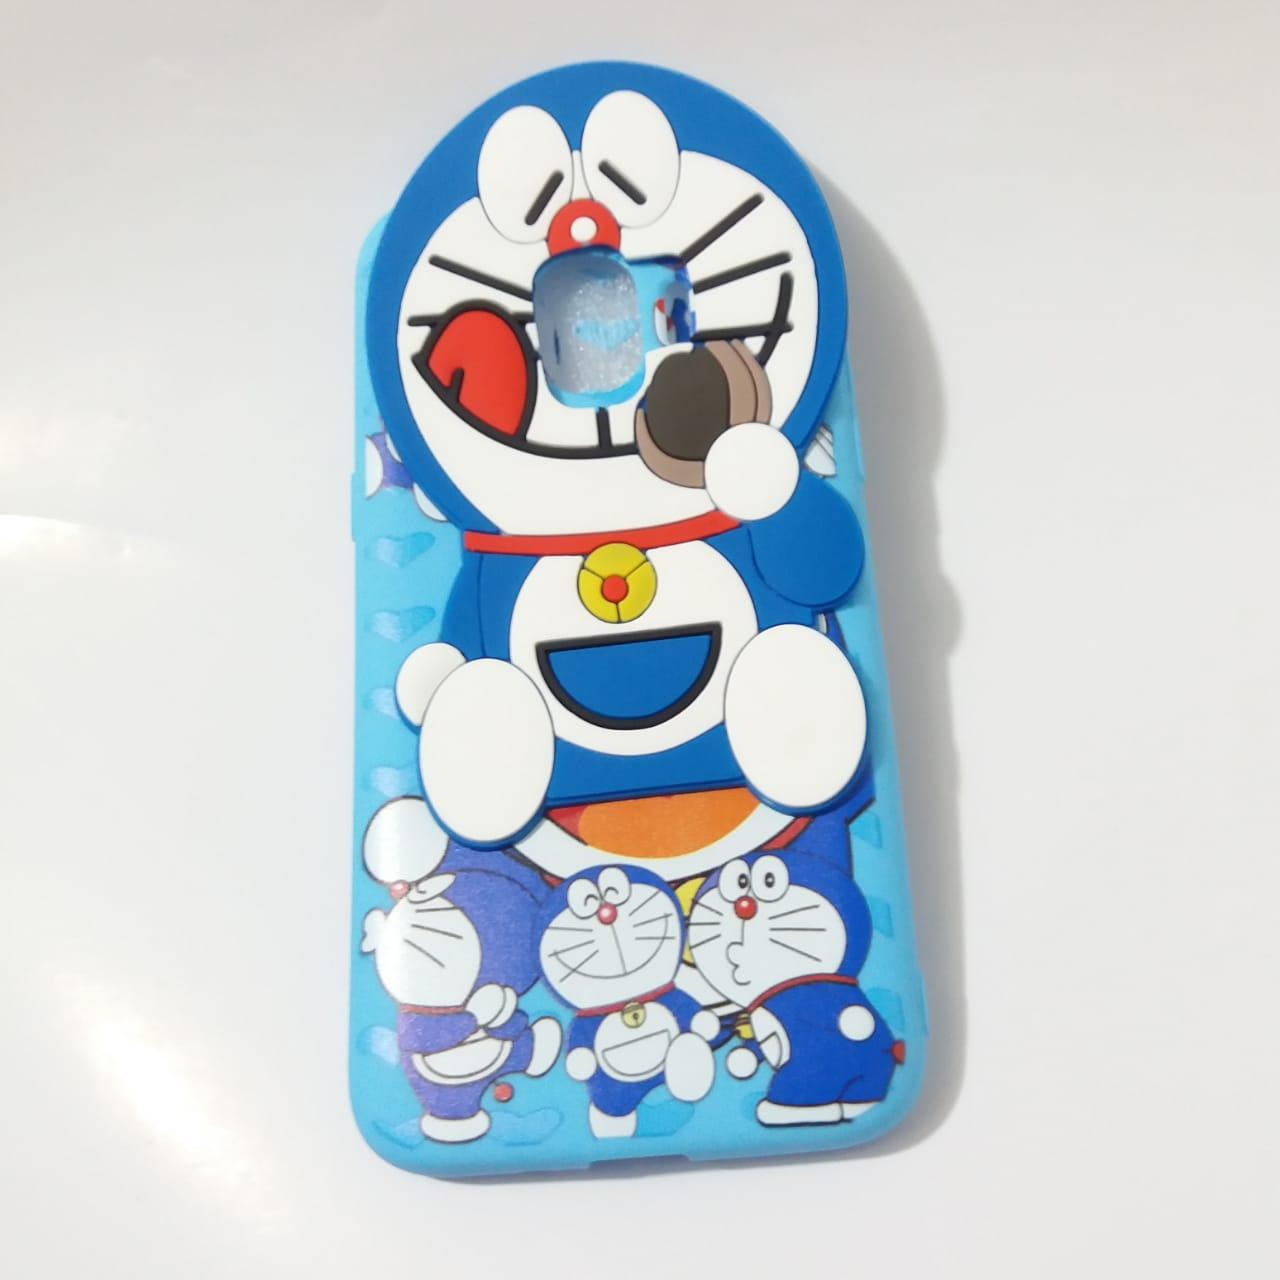 Delkin Boneka Kartun Karakter Doraemon Softcase Casing for Samsung Galaxy J2 Pro [Silicon/3D